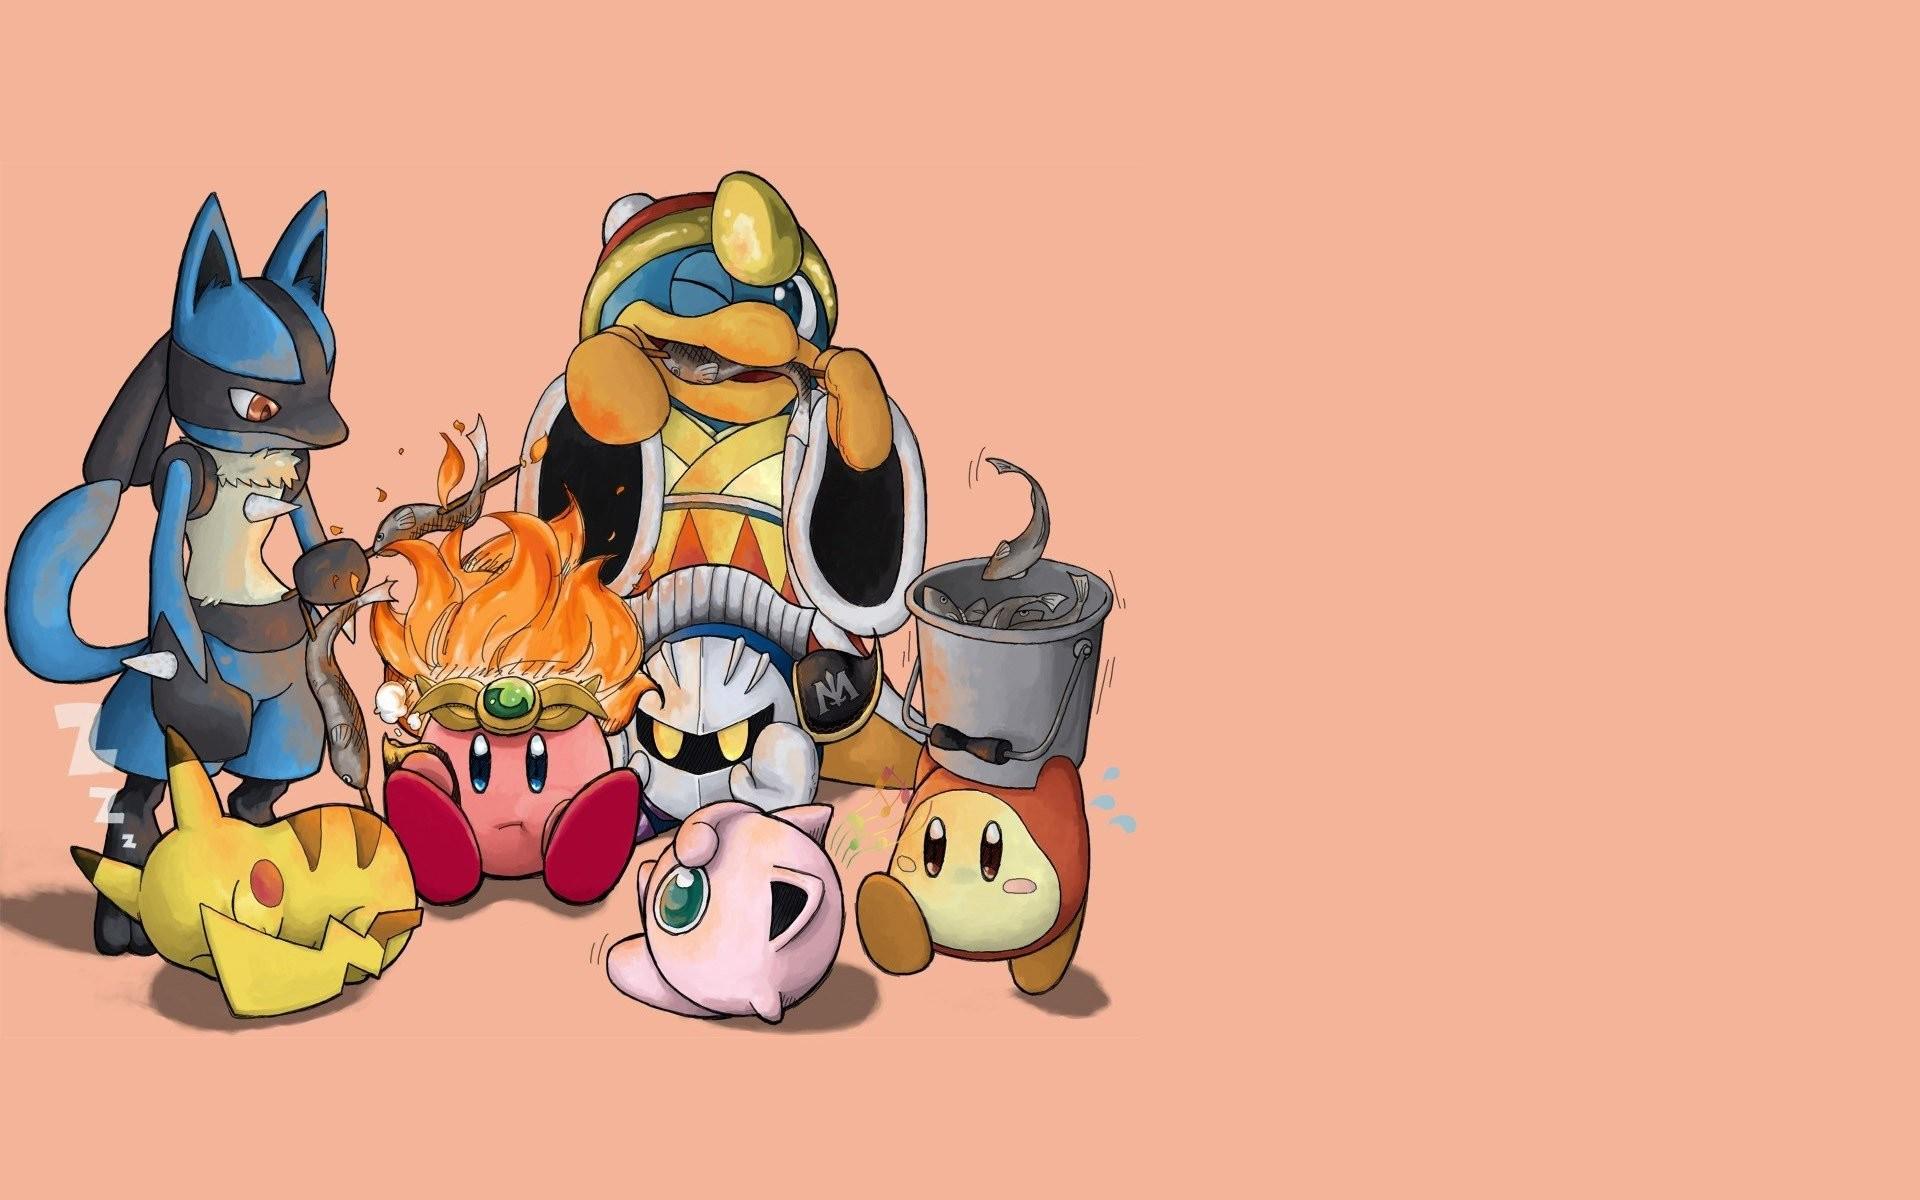 Link download full album: Pokemon HD Wallpapers Full HD Free Download